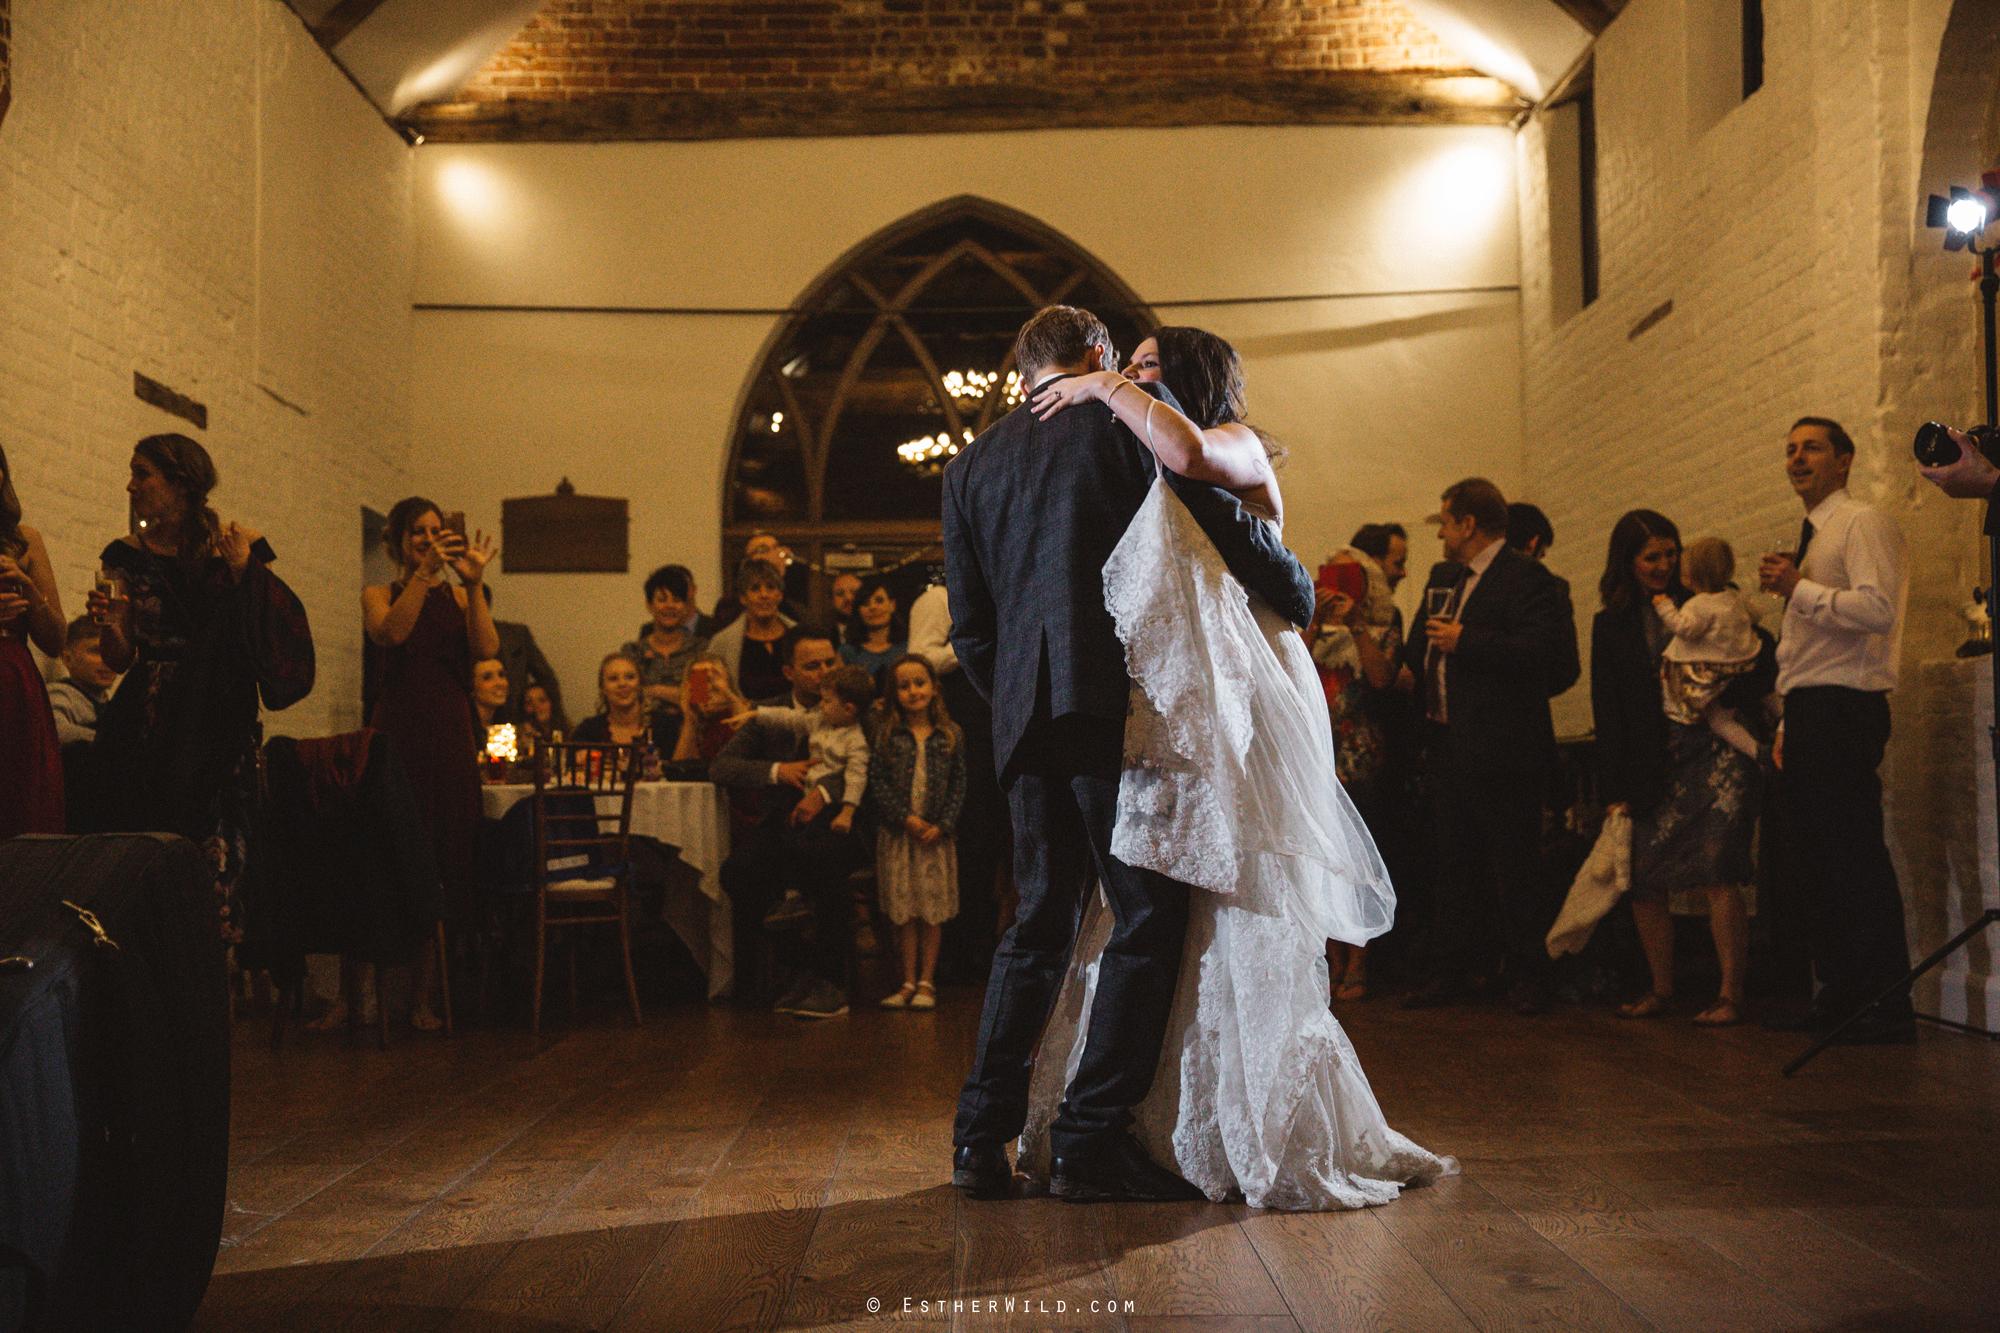 Reading_Room_Weddings_Alby_Norwich_Photographer_Esther_Wild_IMG_3355.jpg